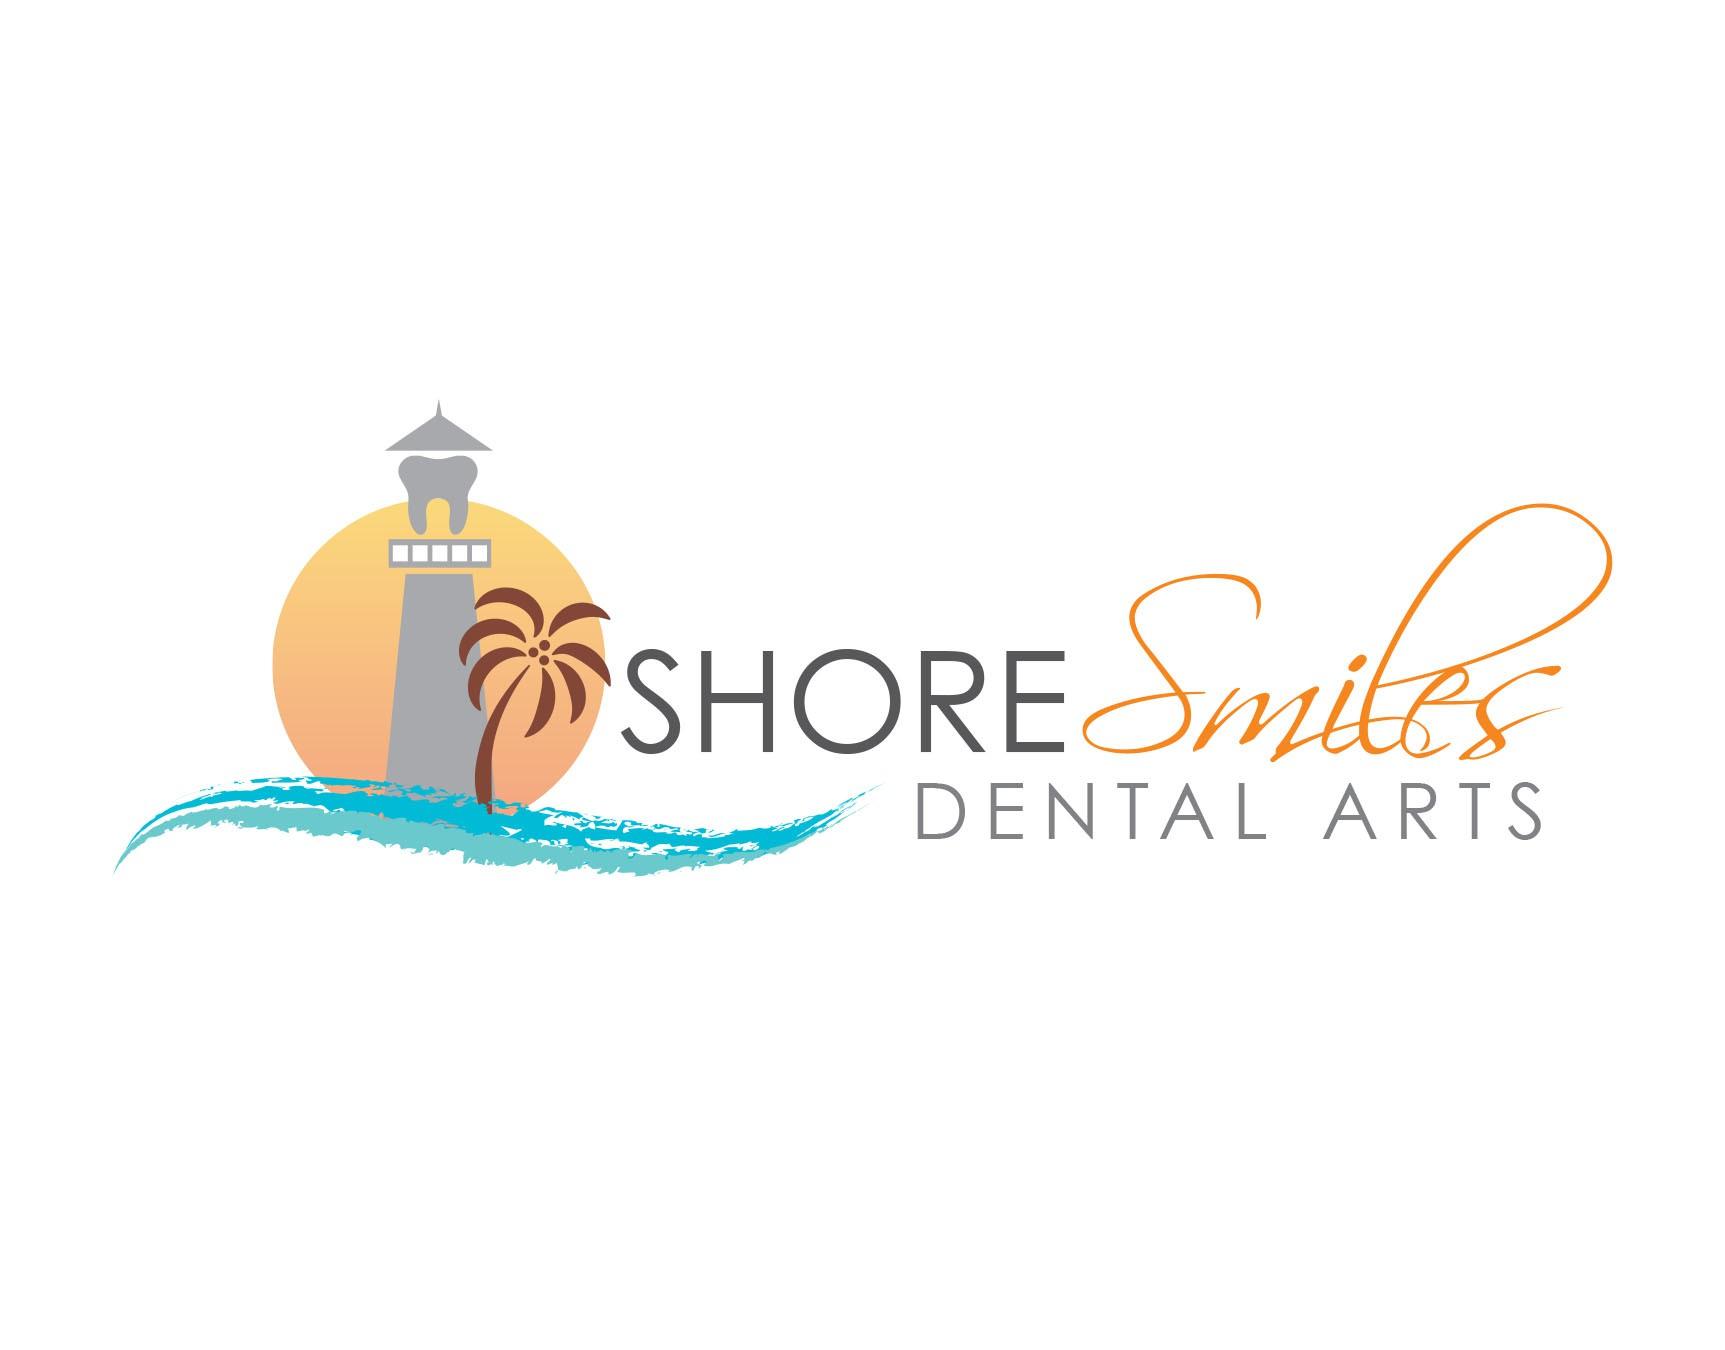 Shore Smiles Dental Arts needs a new logo